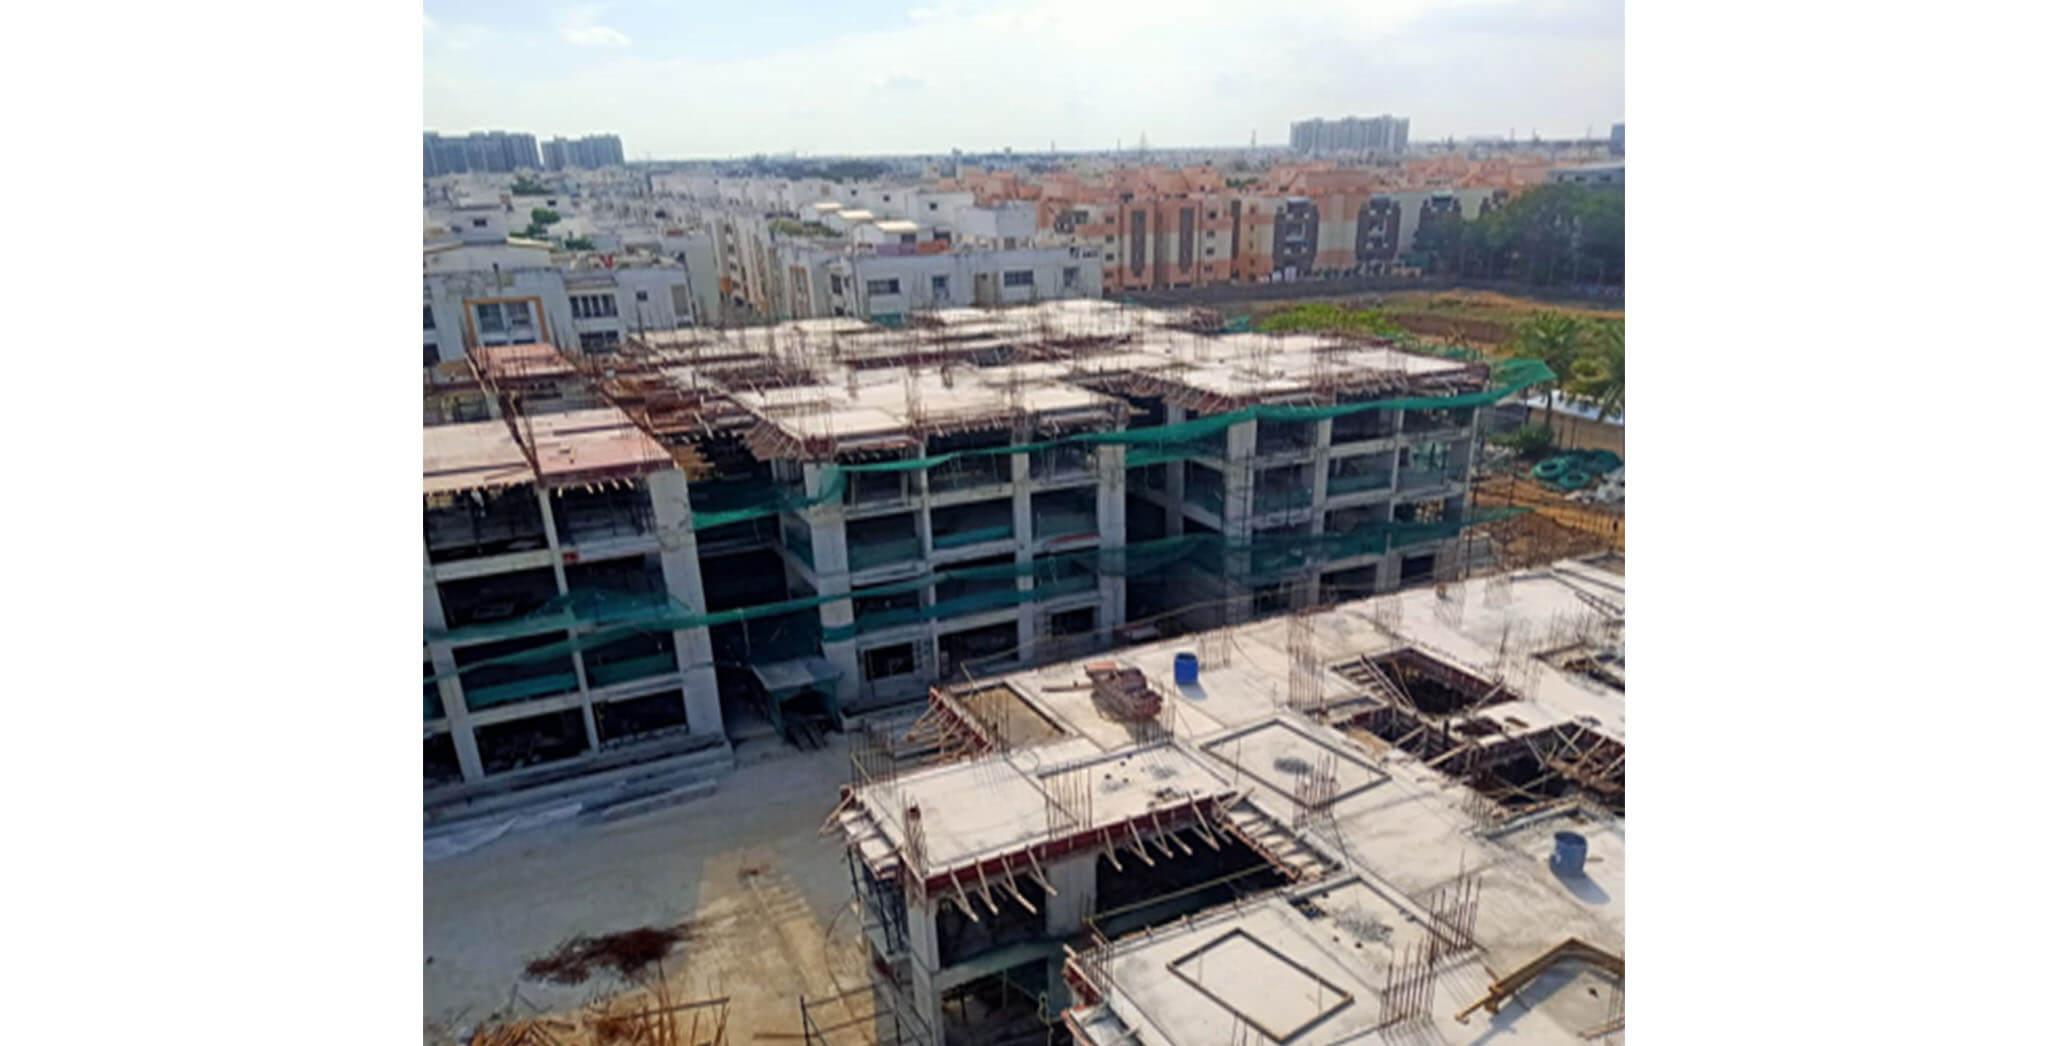 Jun 2021 - Block H—Excavation completed, foundational works completed, ground floor slab completed, first floor slab completed, second floor slab completed, third floor slab completed, fourth floor slab in progress